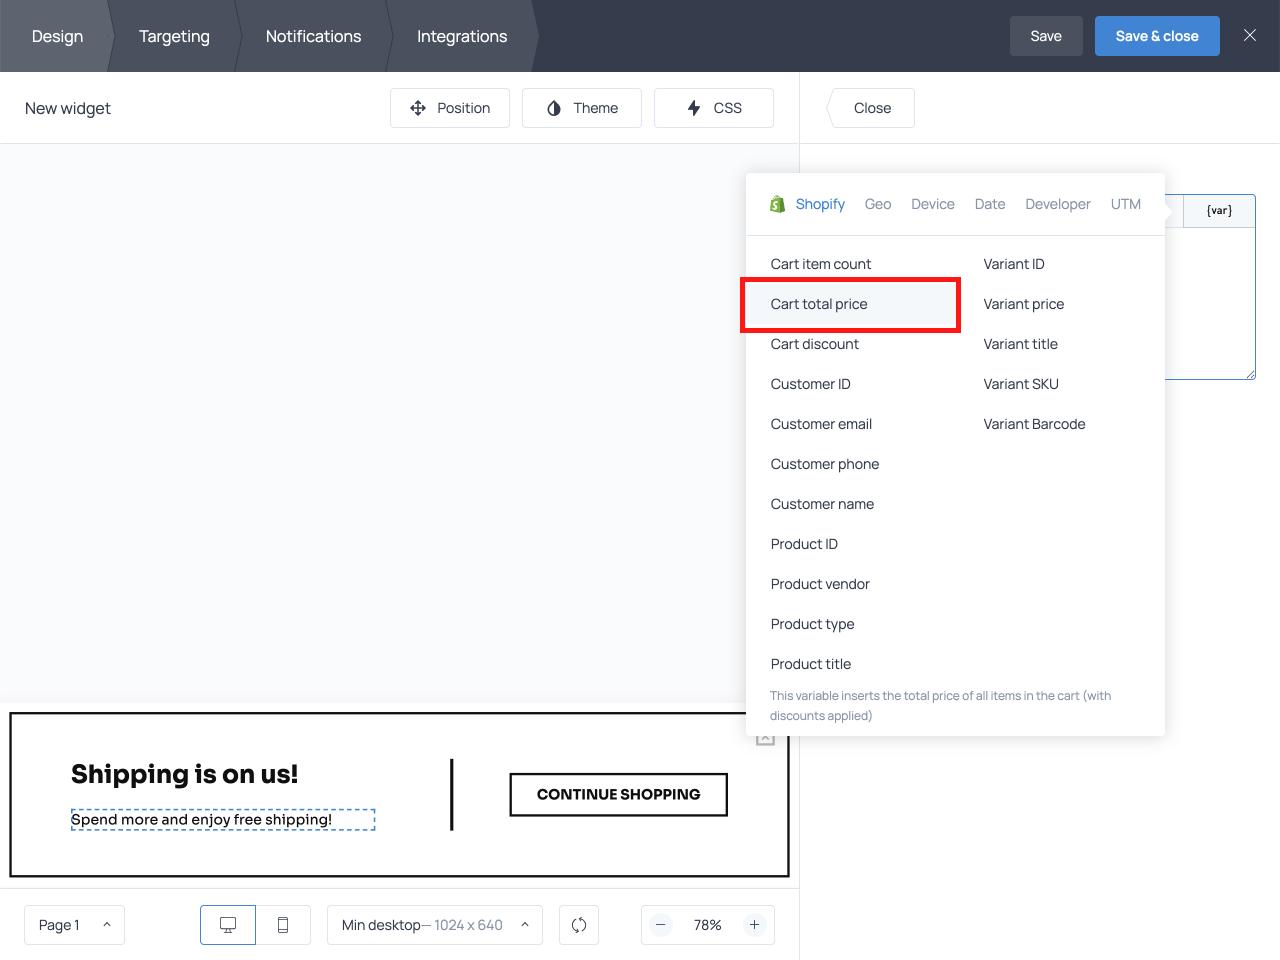 Cart total price option of the var tab